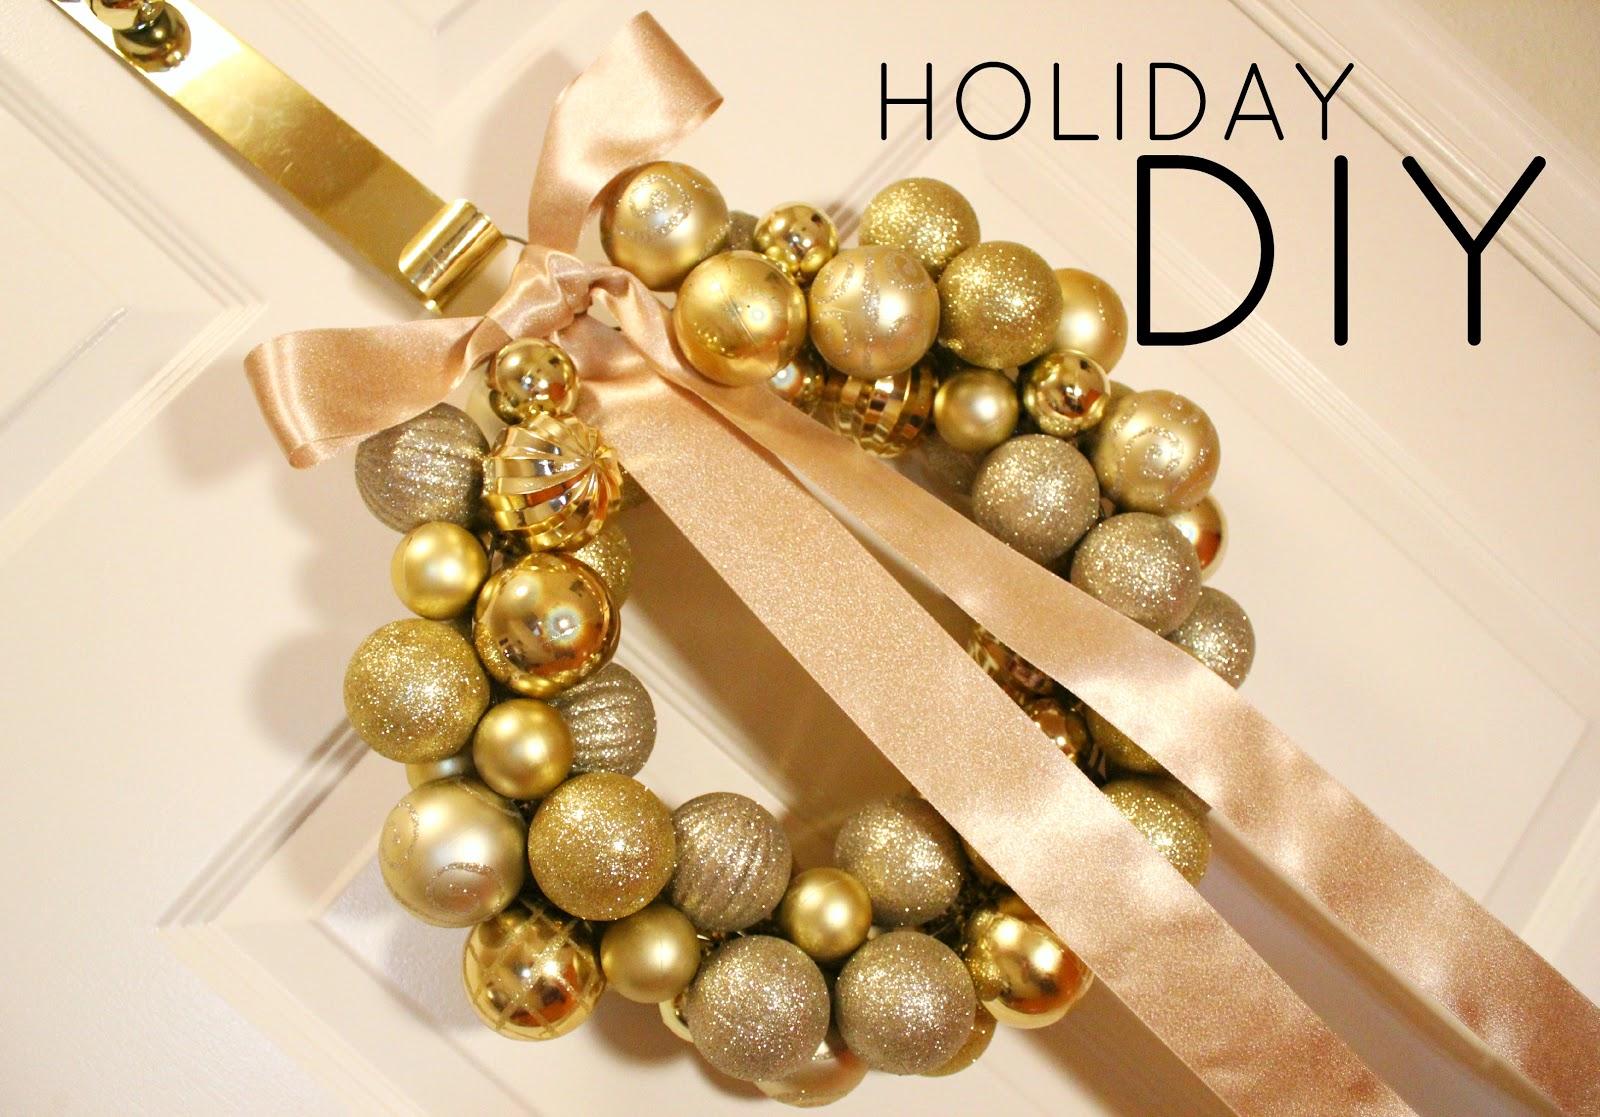 BentleyBlonde: Christmas Ornament Ball Wreath Tutorial